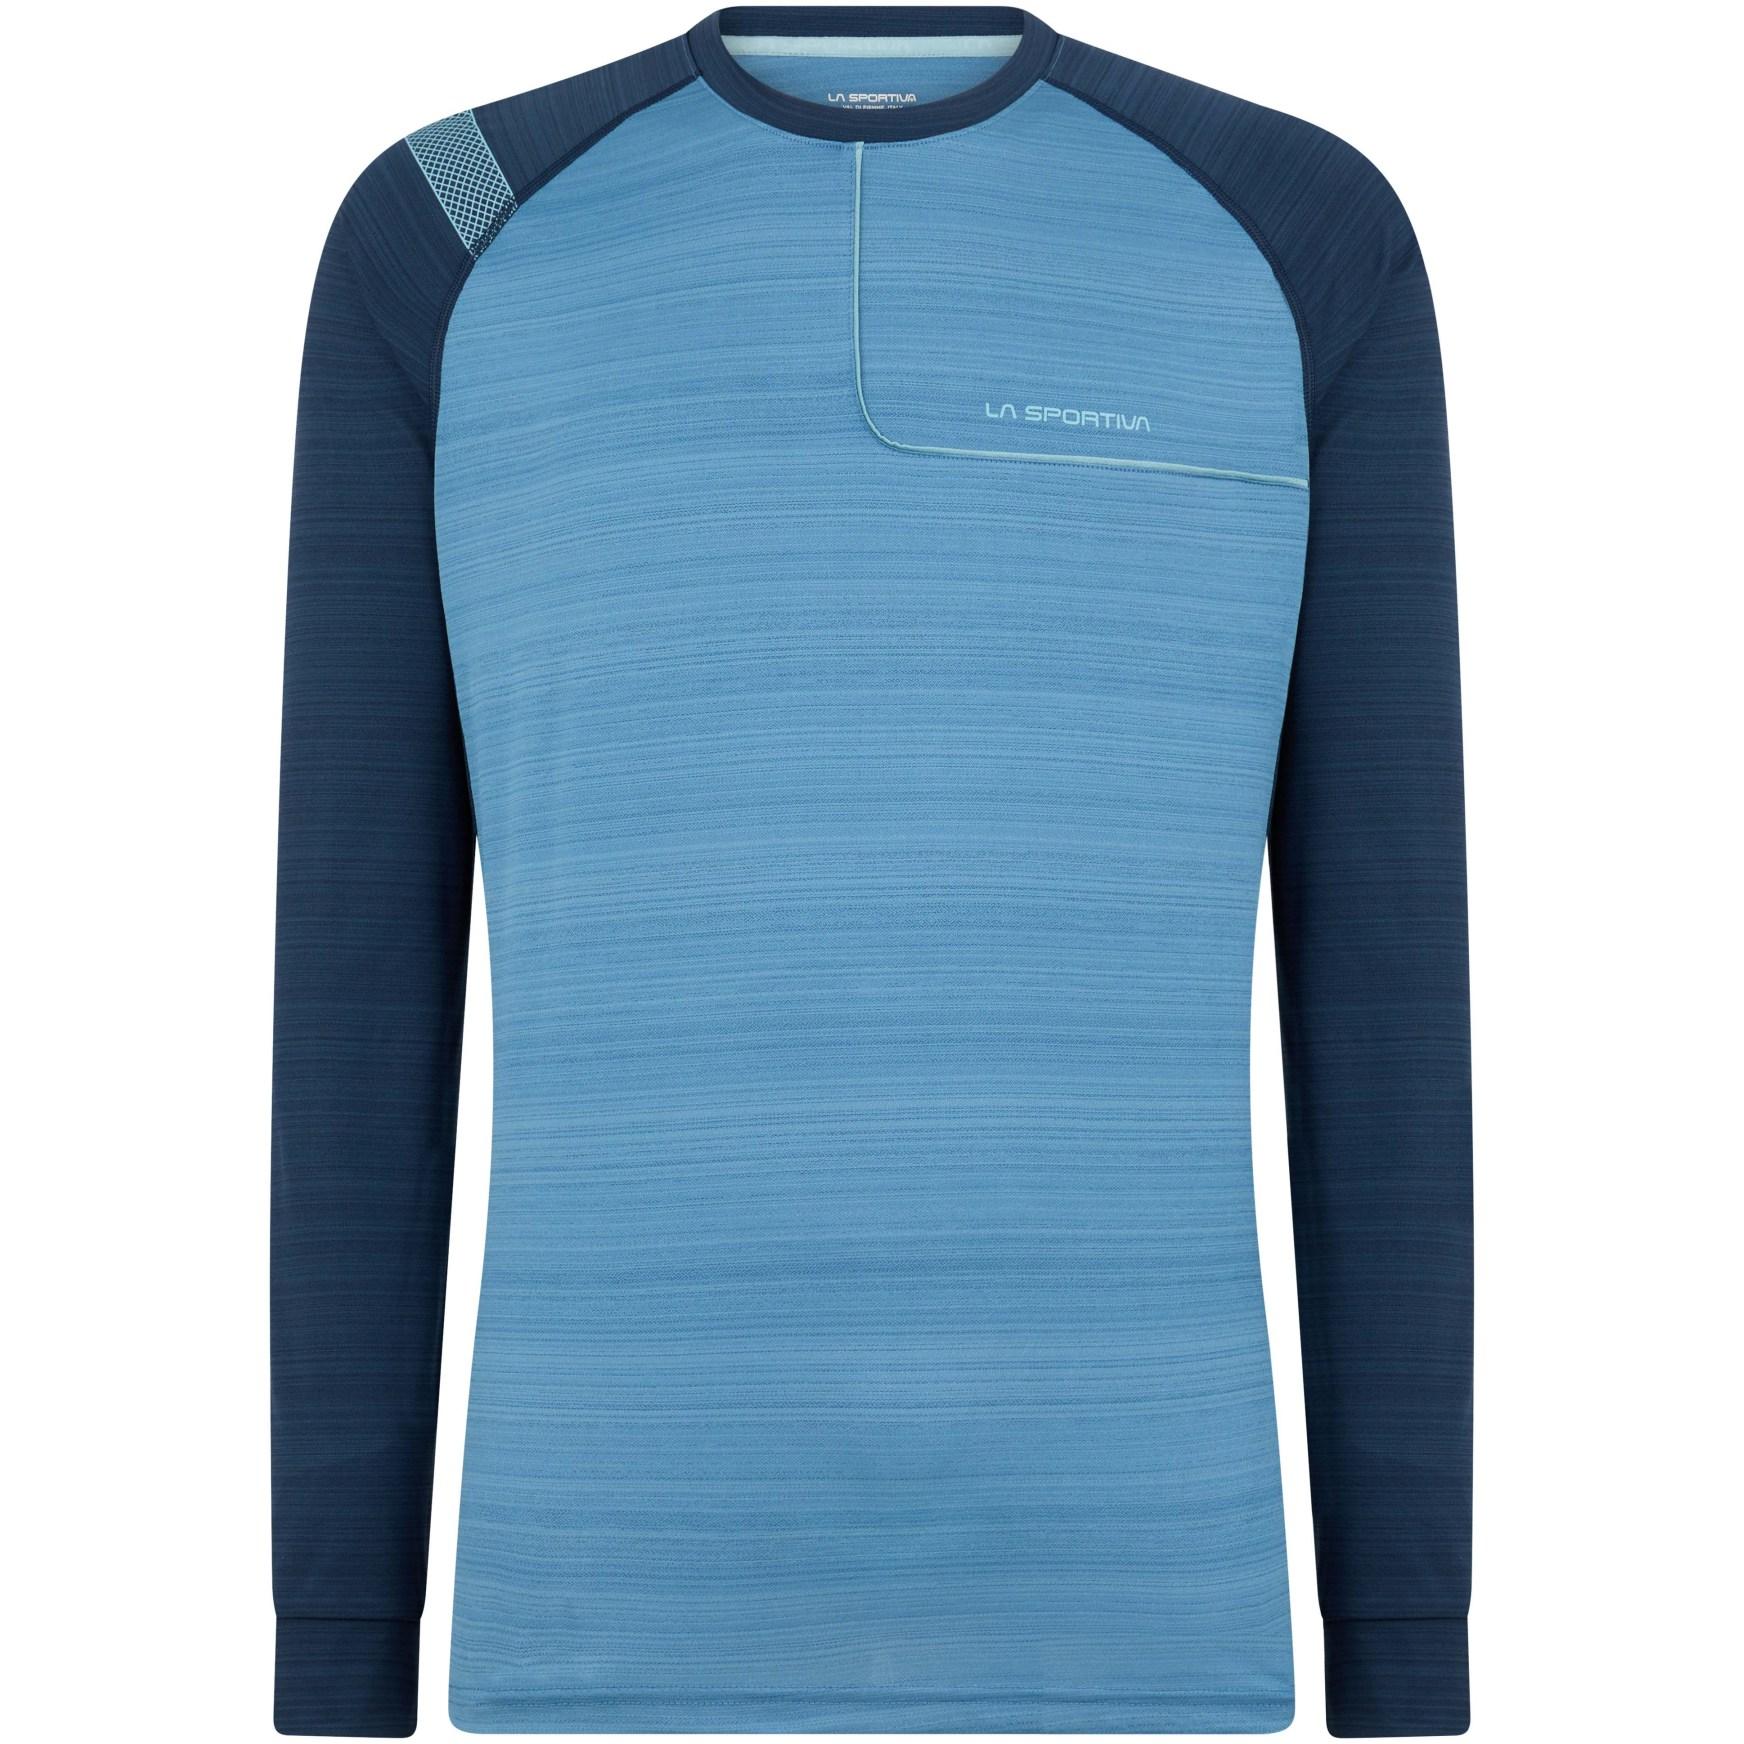 La Sportiva Tour Langarmshirt - Night Blue/Cedar